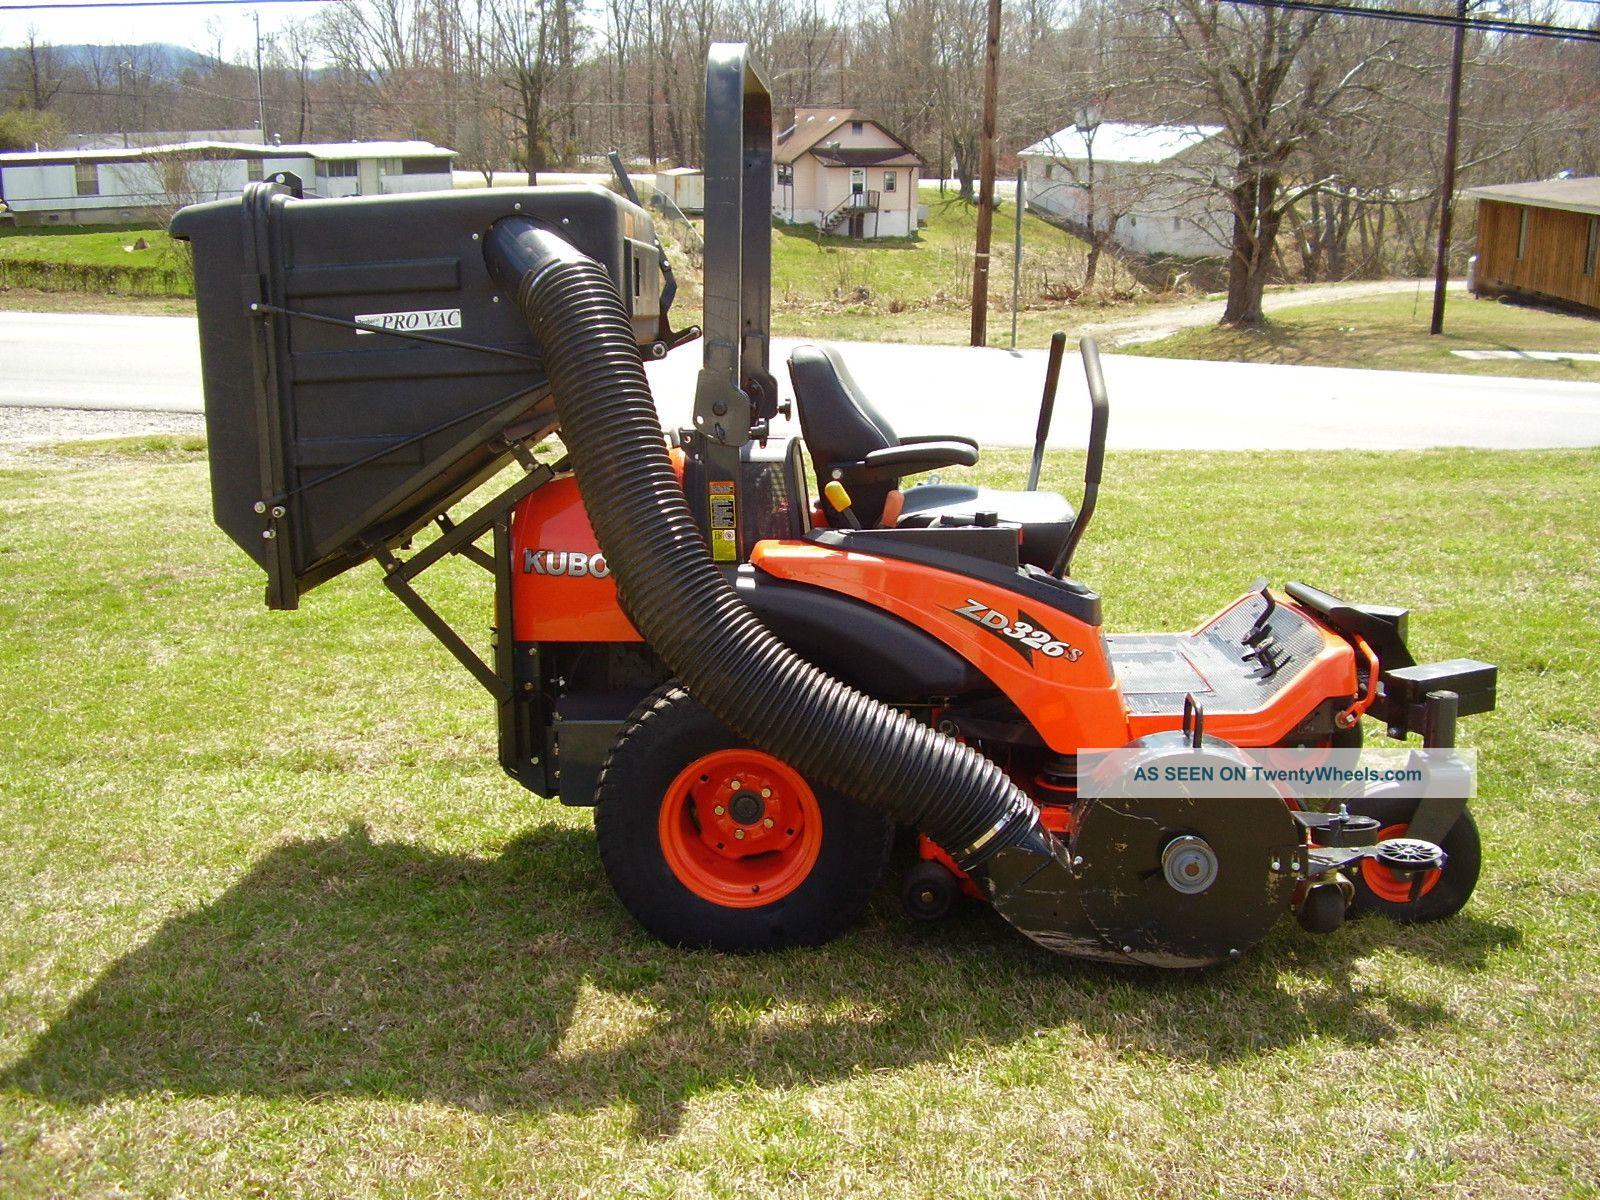 kubota leaf bagger: kubota lawn tractors review. kubota b hsd